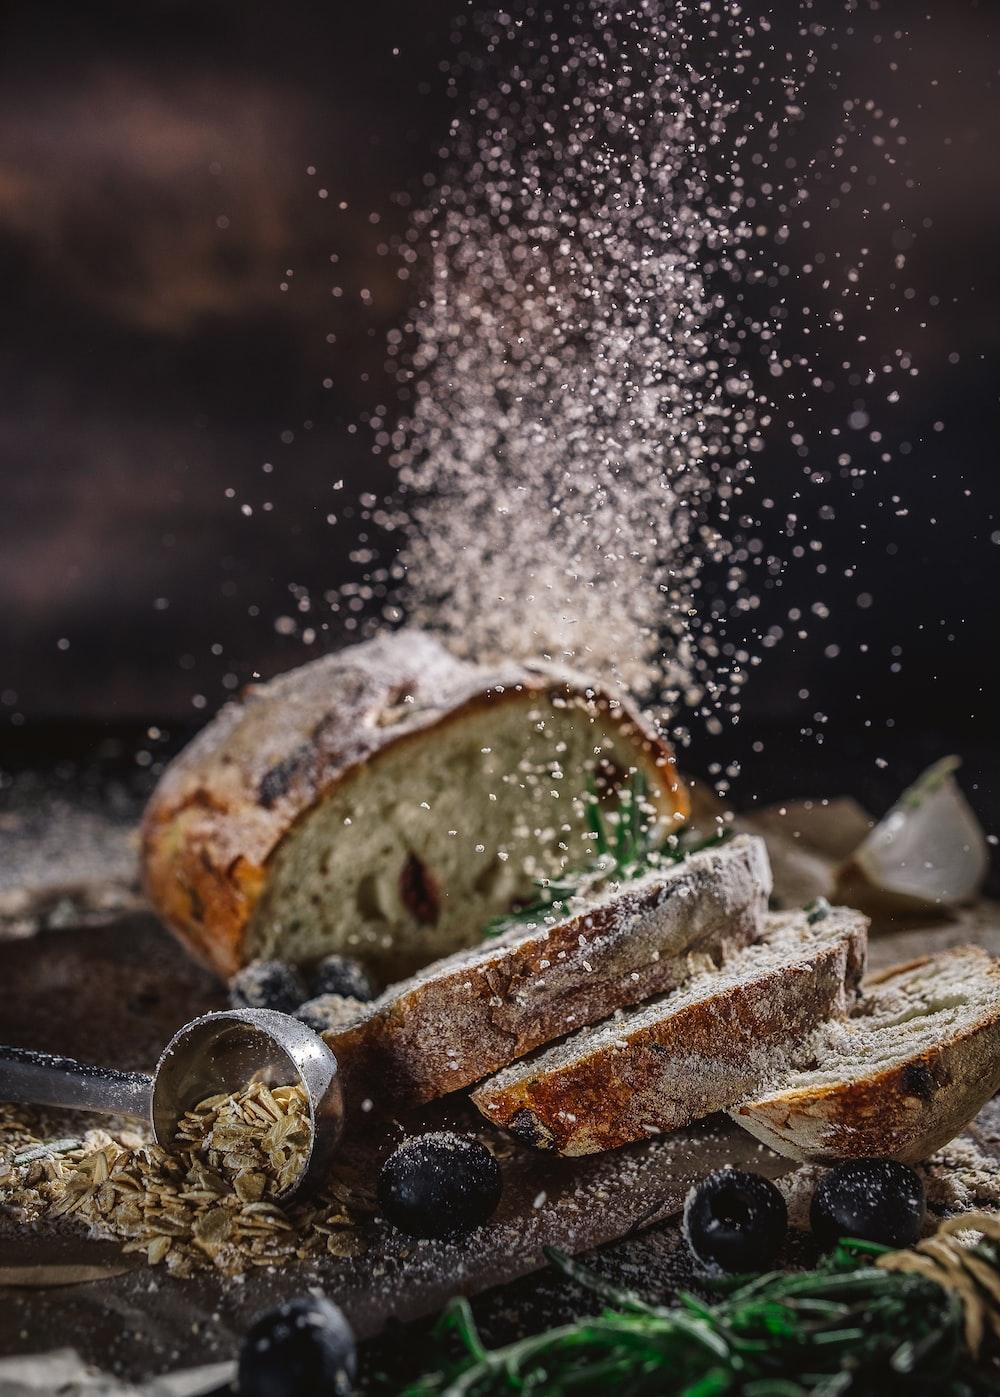 sliced bread on table